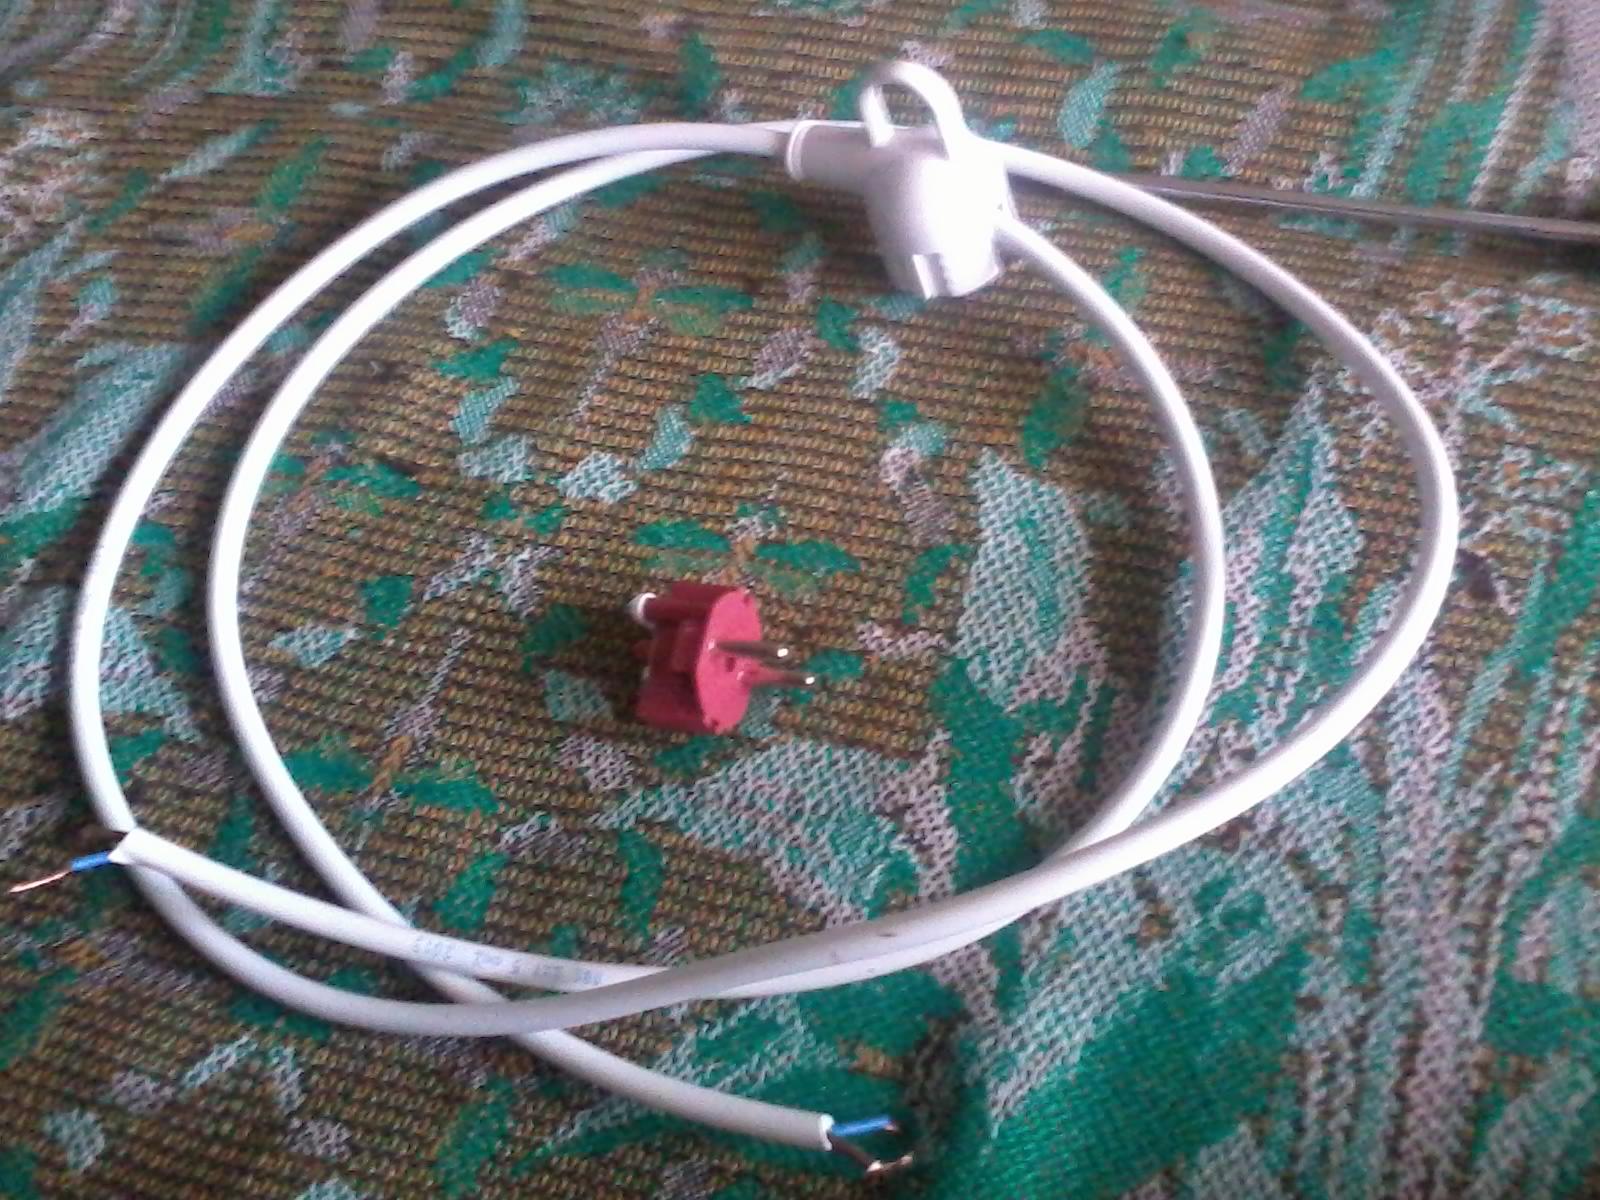 кабель кг 4х35 масса